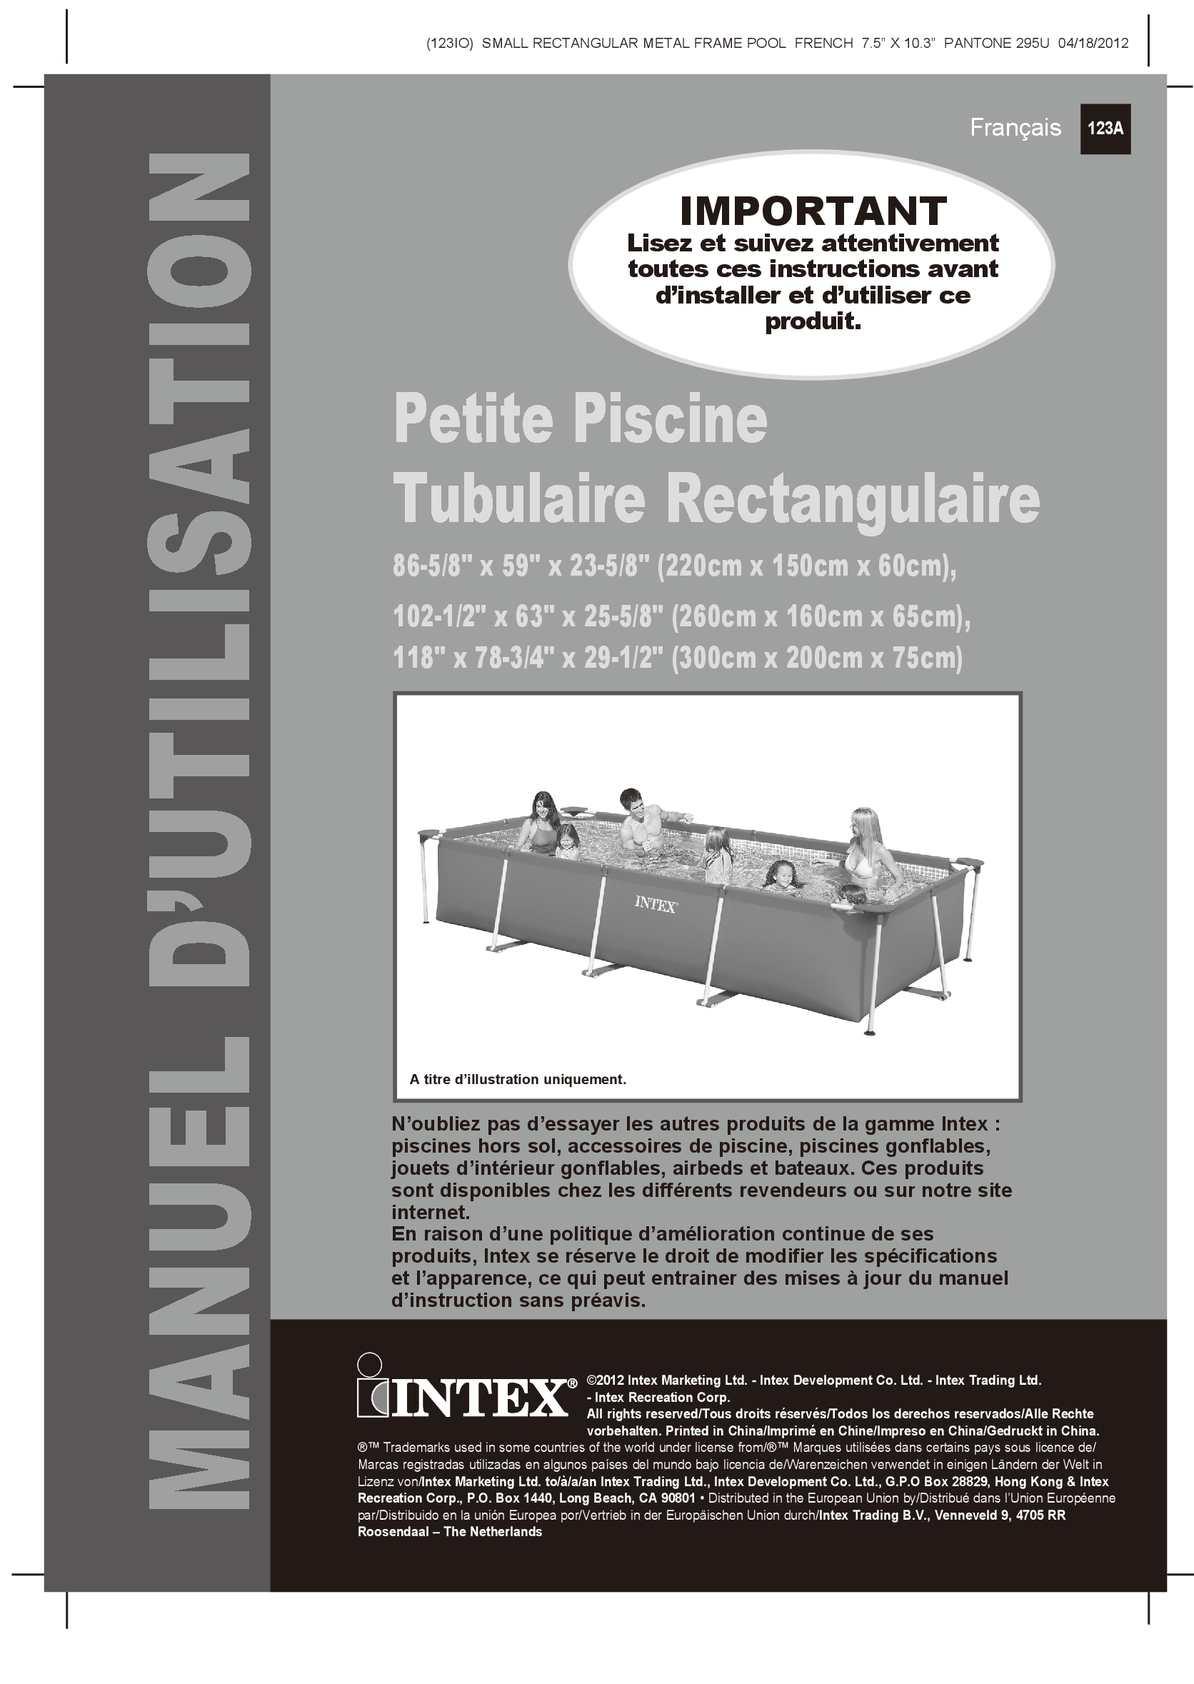 Calam o notice de montage piscine tubulaire intex metal - Intex piscine tubulaire rectangulaire ...